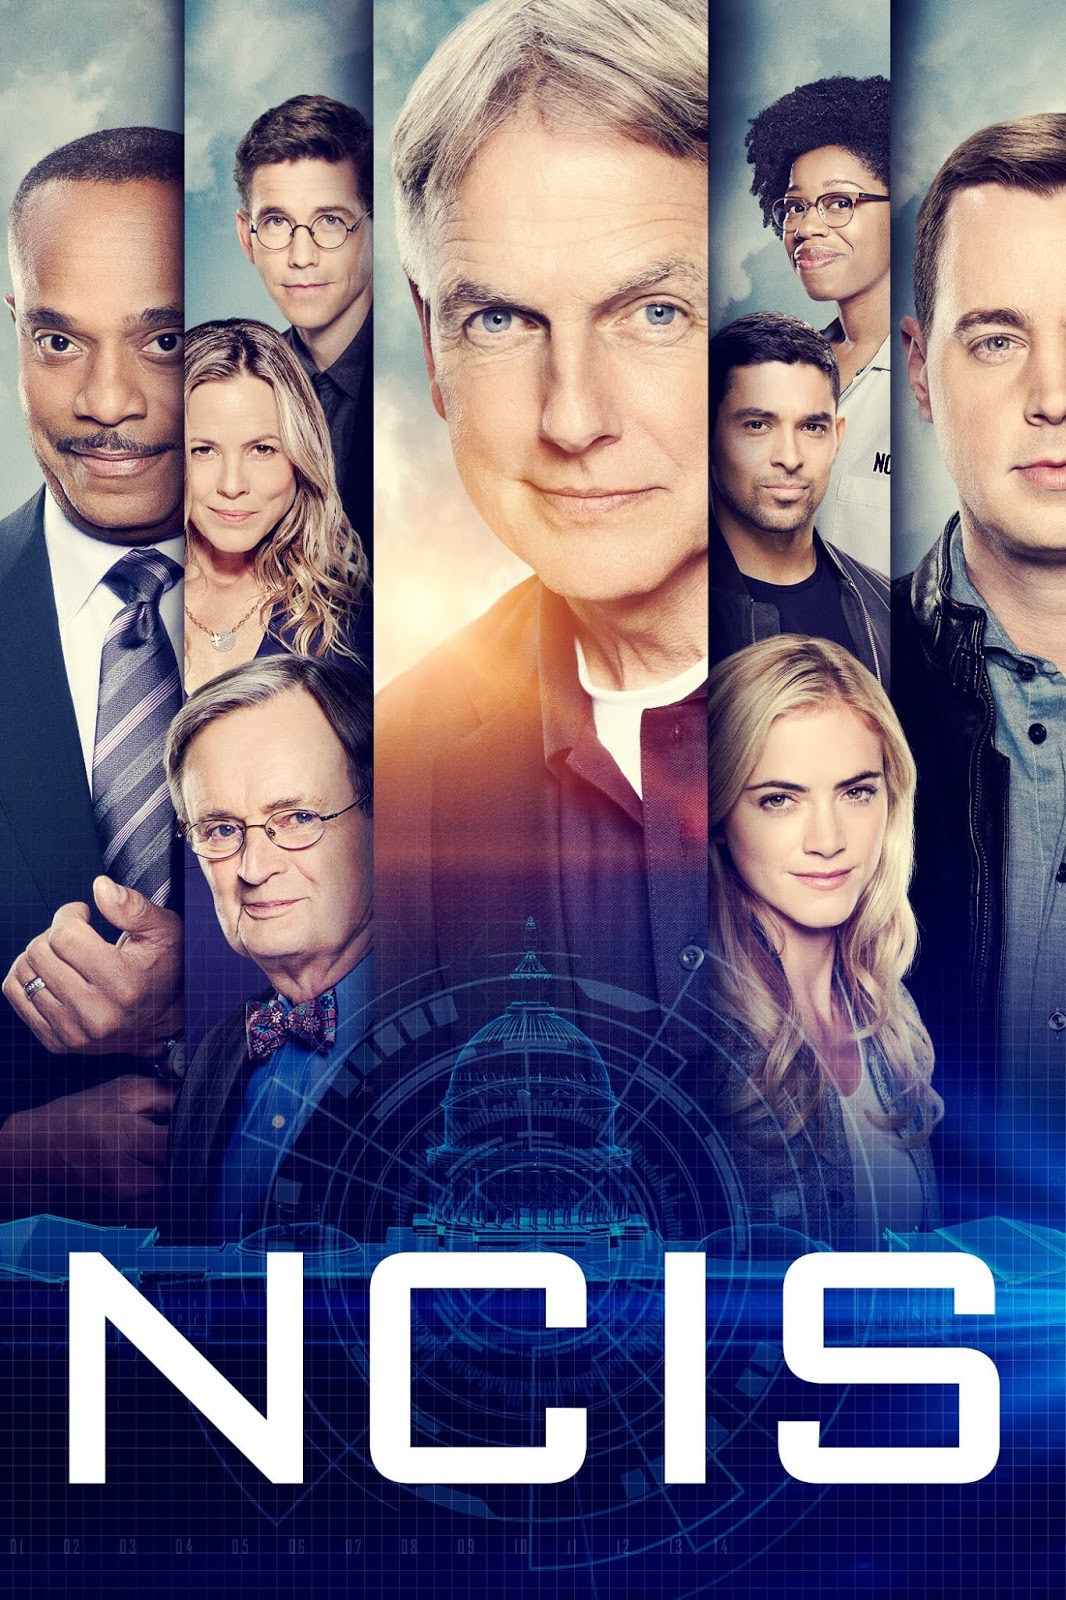 NCIS Serie Completa 14/14 Dual Latino/Ingles 720p